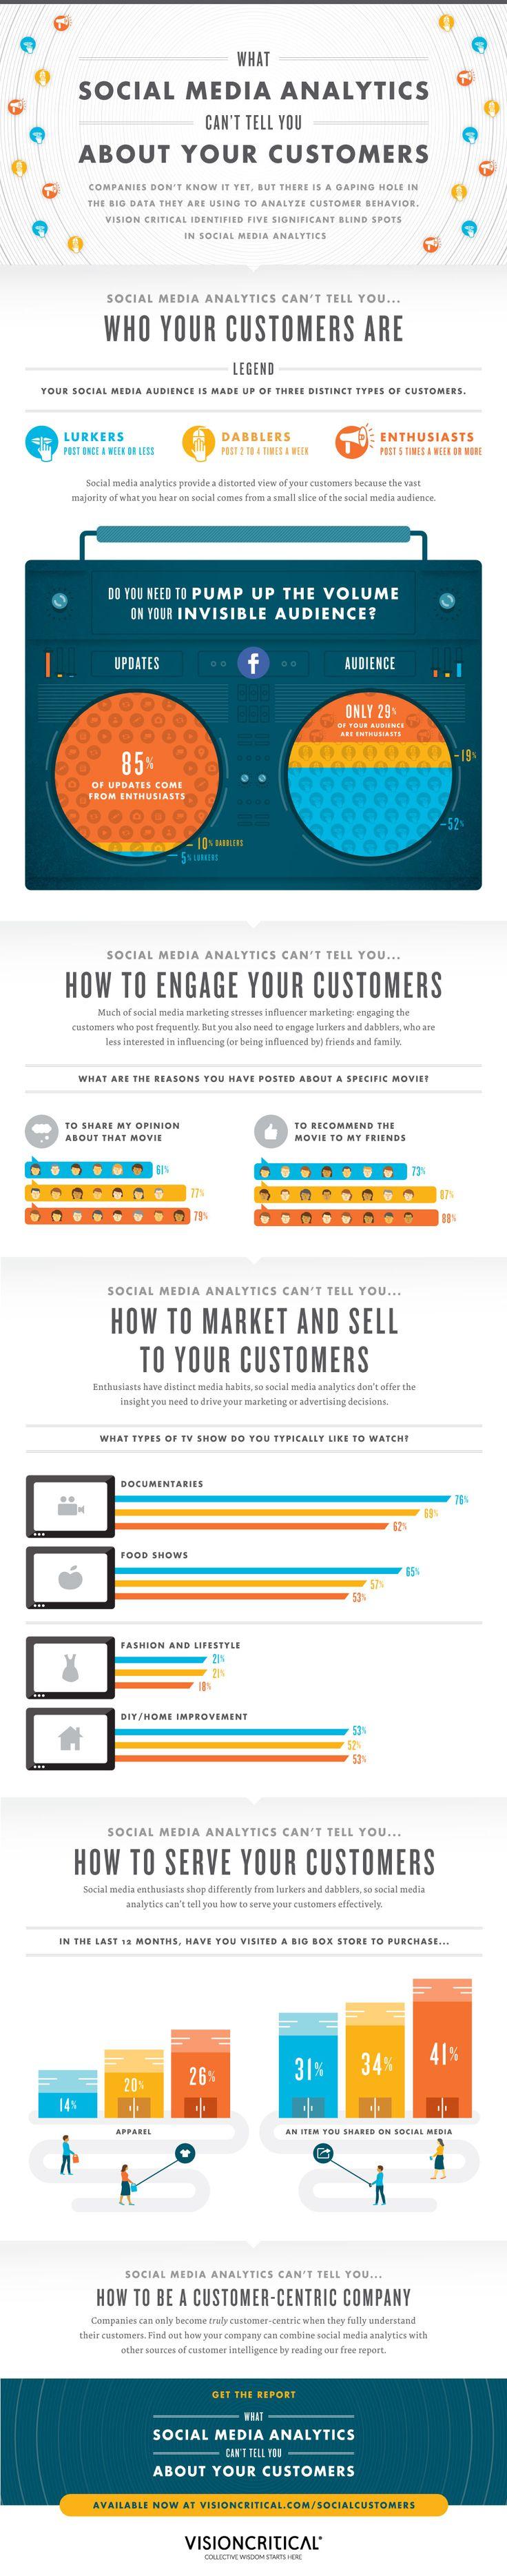 Qué No Te Pueden Decir Las Analíticas Sociales Sobre Tus Clientes / What Social Media Analytics Can't Tell You About Your Customers